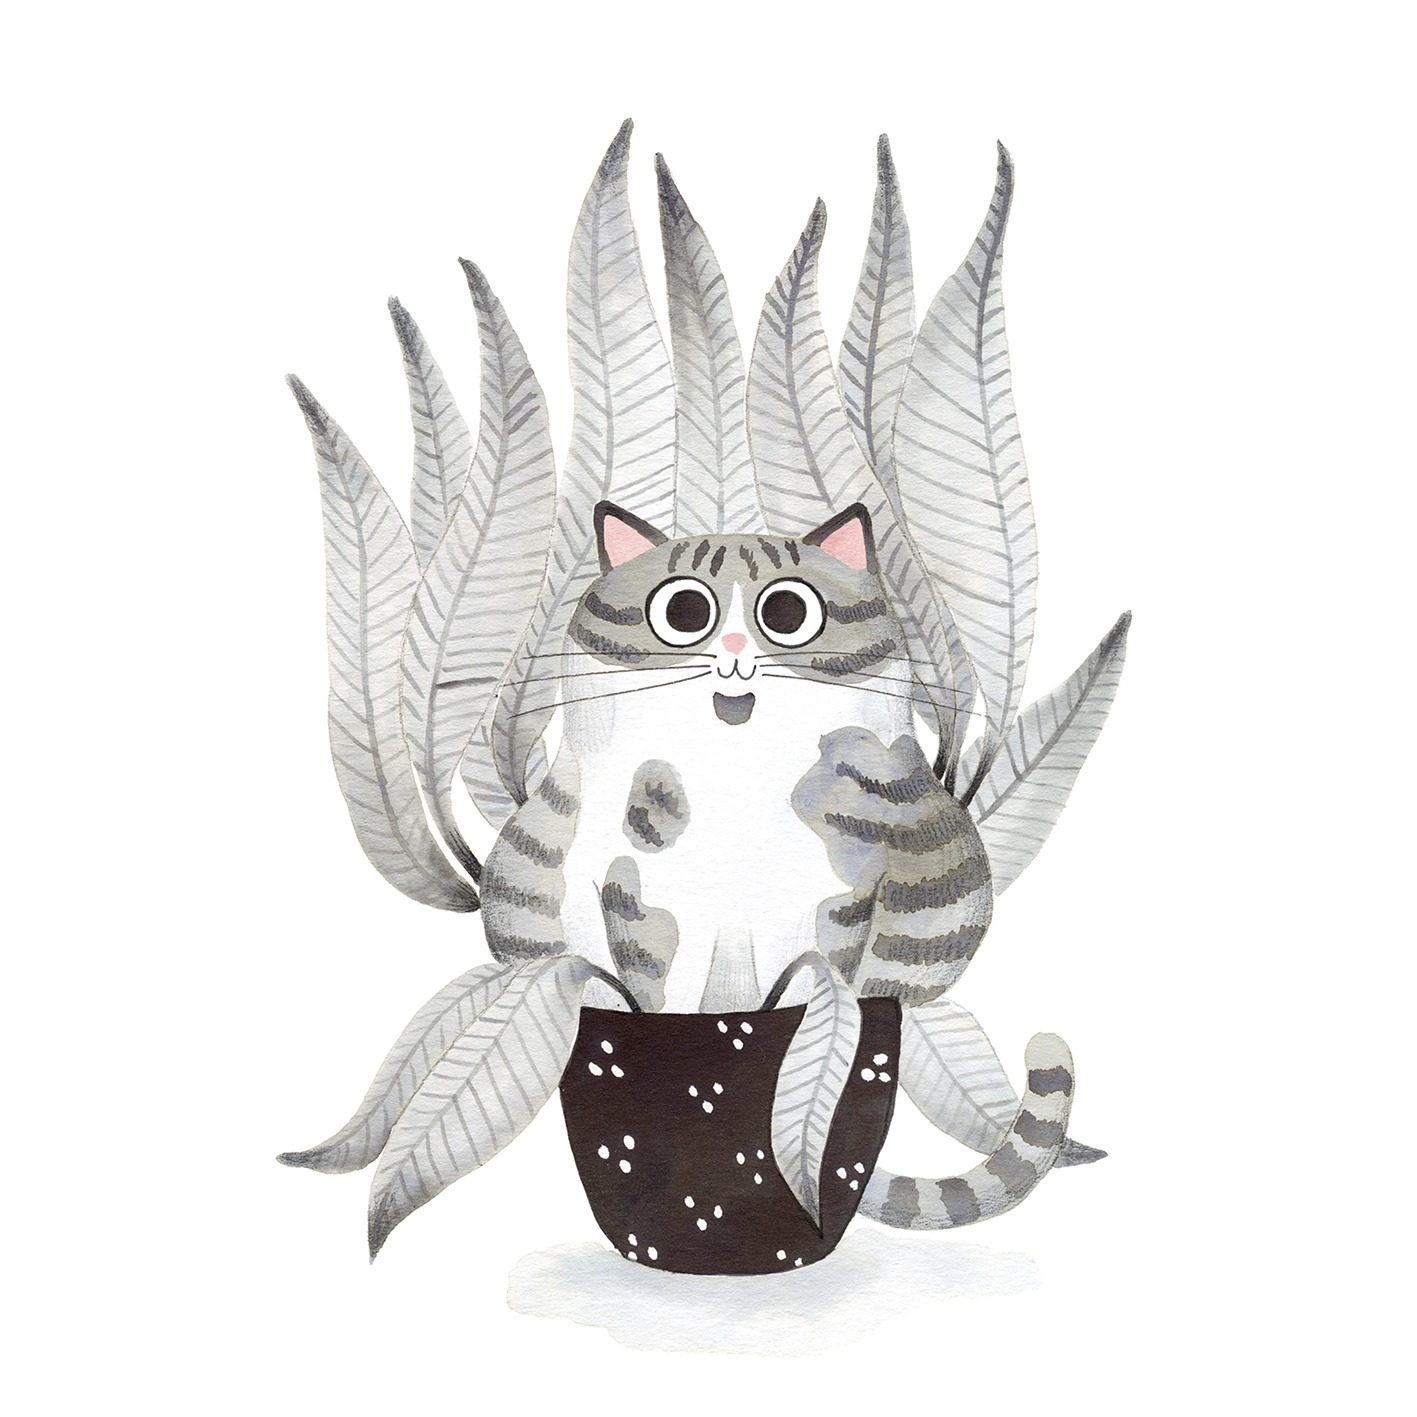 Ilustración de gato, Inktober, gato dentro de planta, retrato de gato